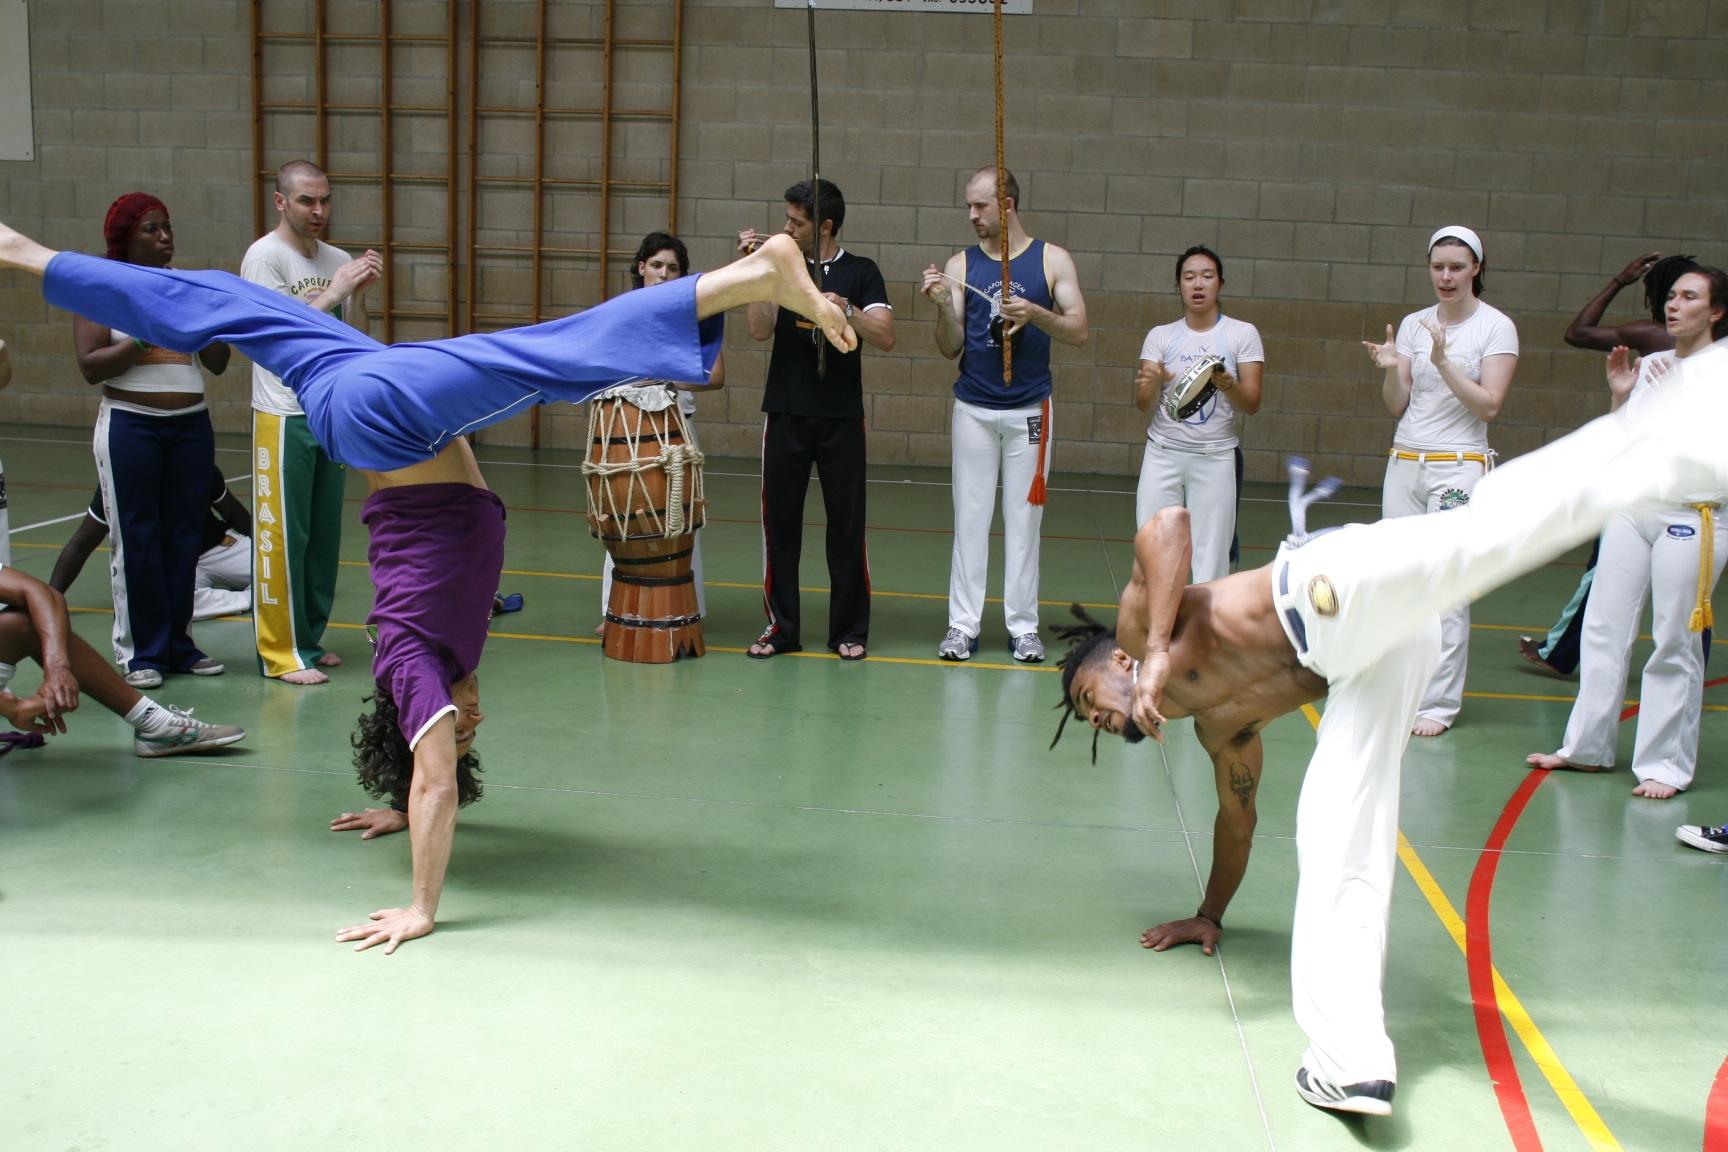 Movimientos de capoeira